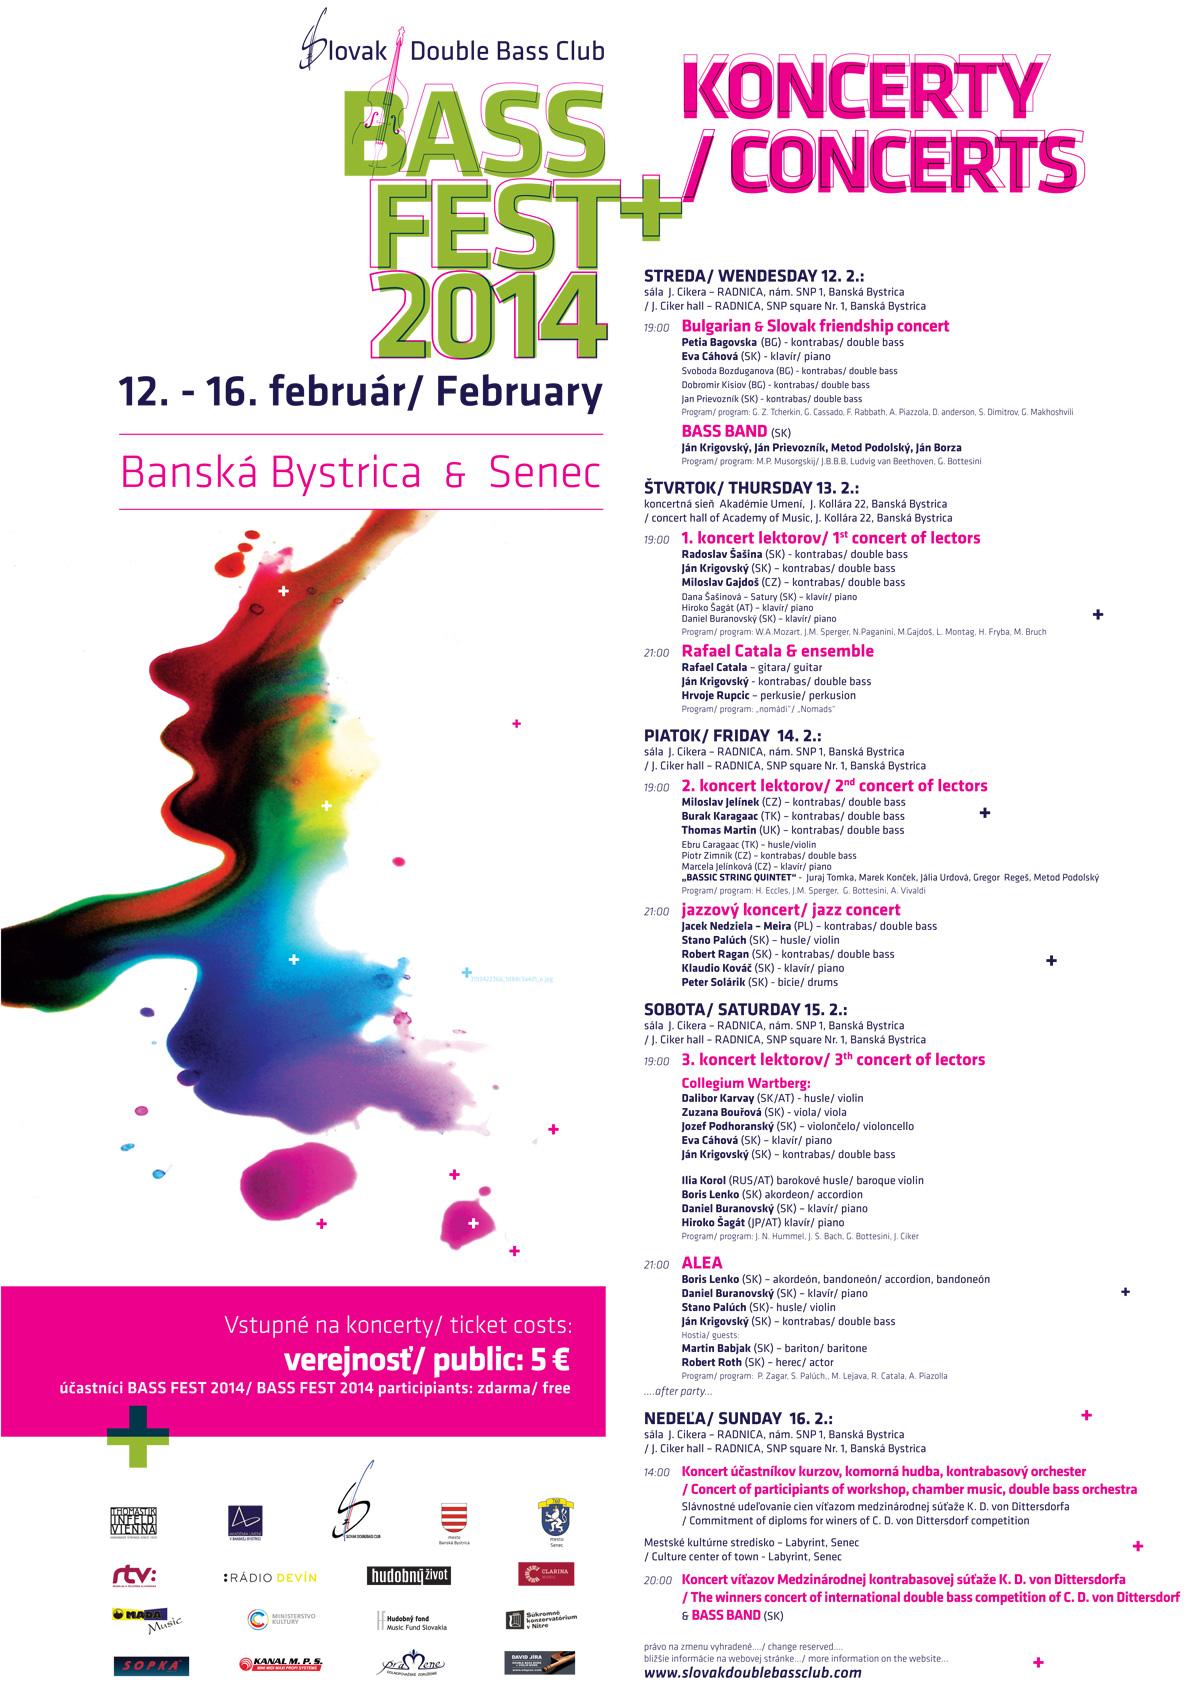 BassFest2014_koncerty_plagat